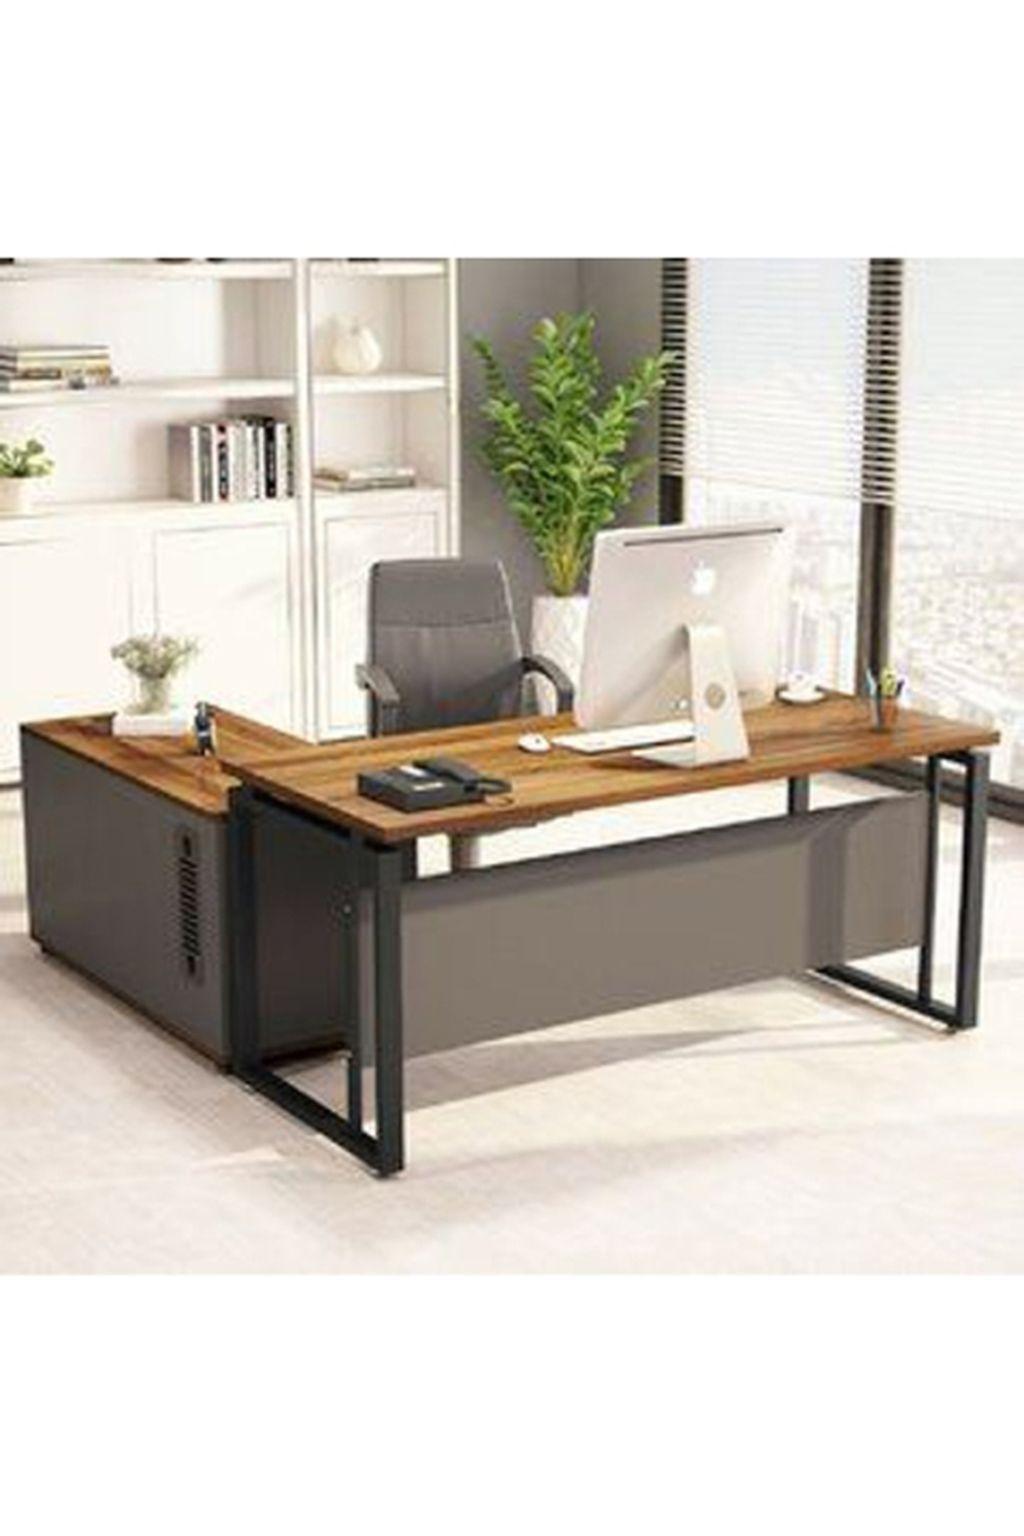 42 Comfy Computer Desk Arrangement Design Ideas That Will